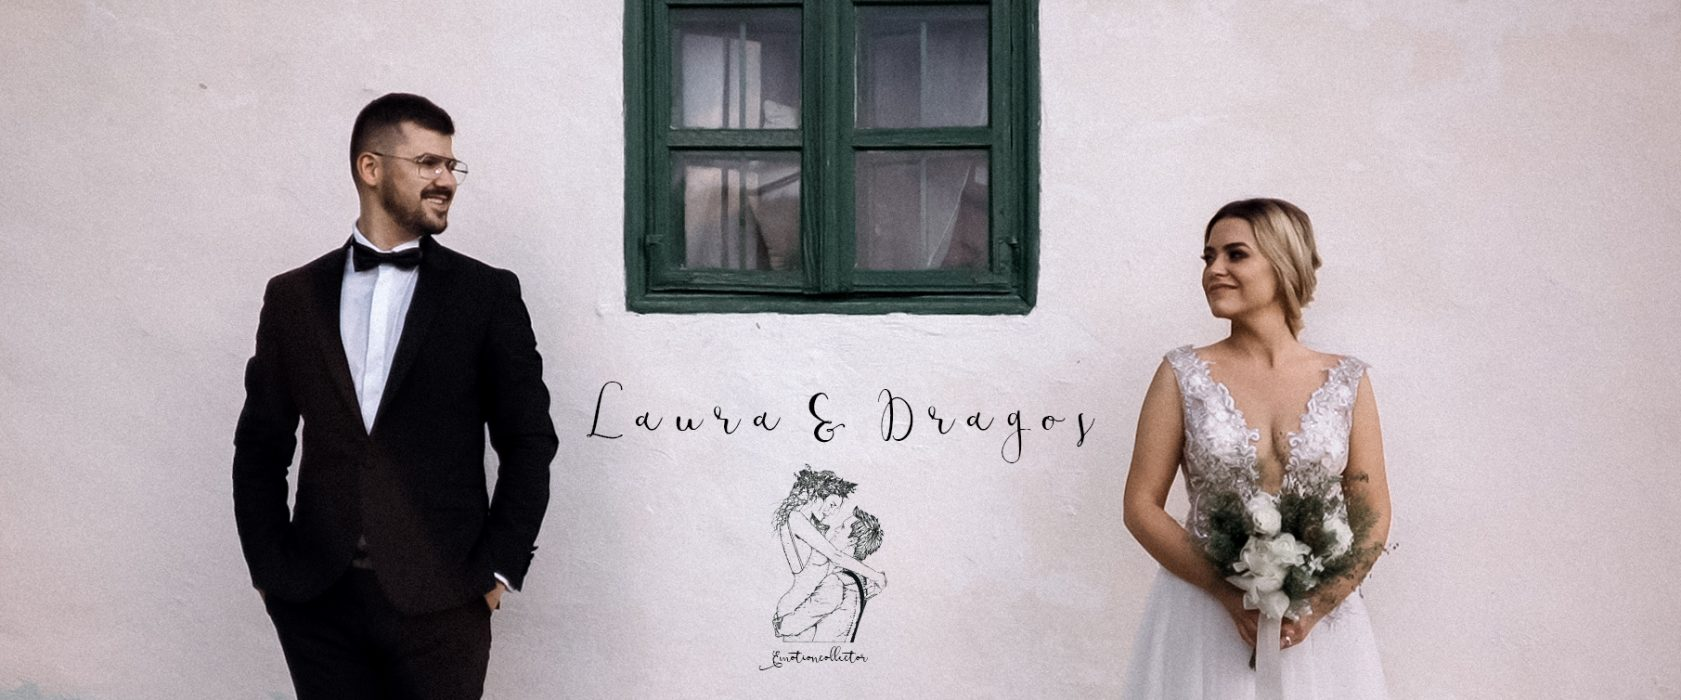 Laura & Dragos